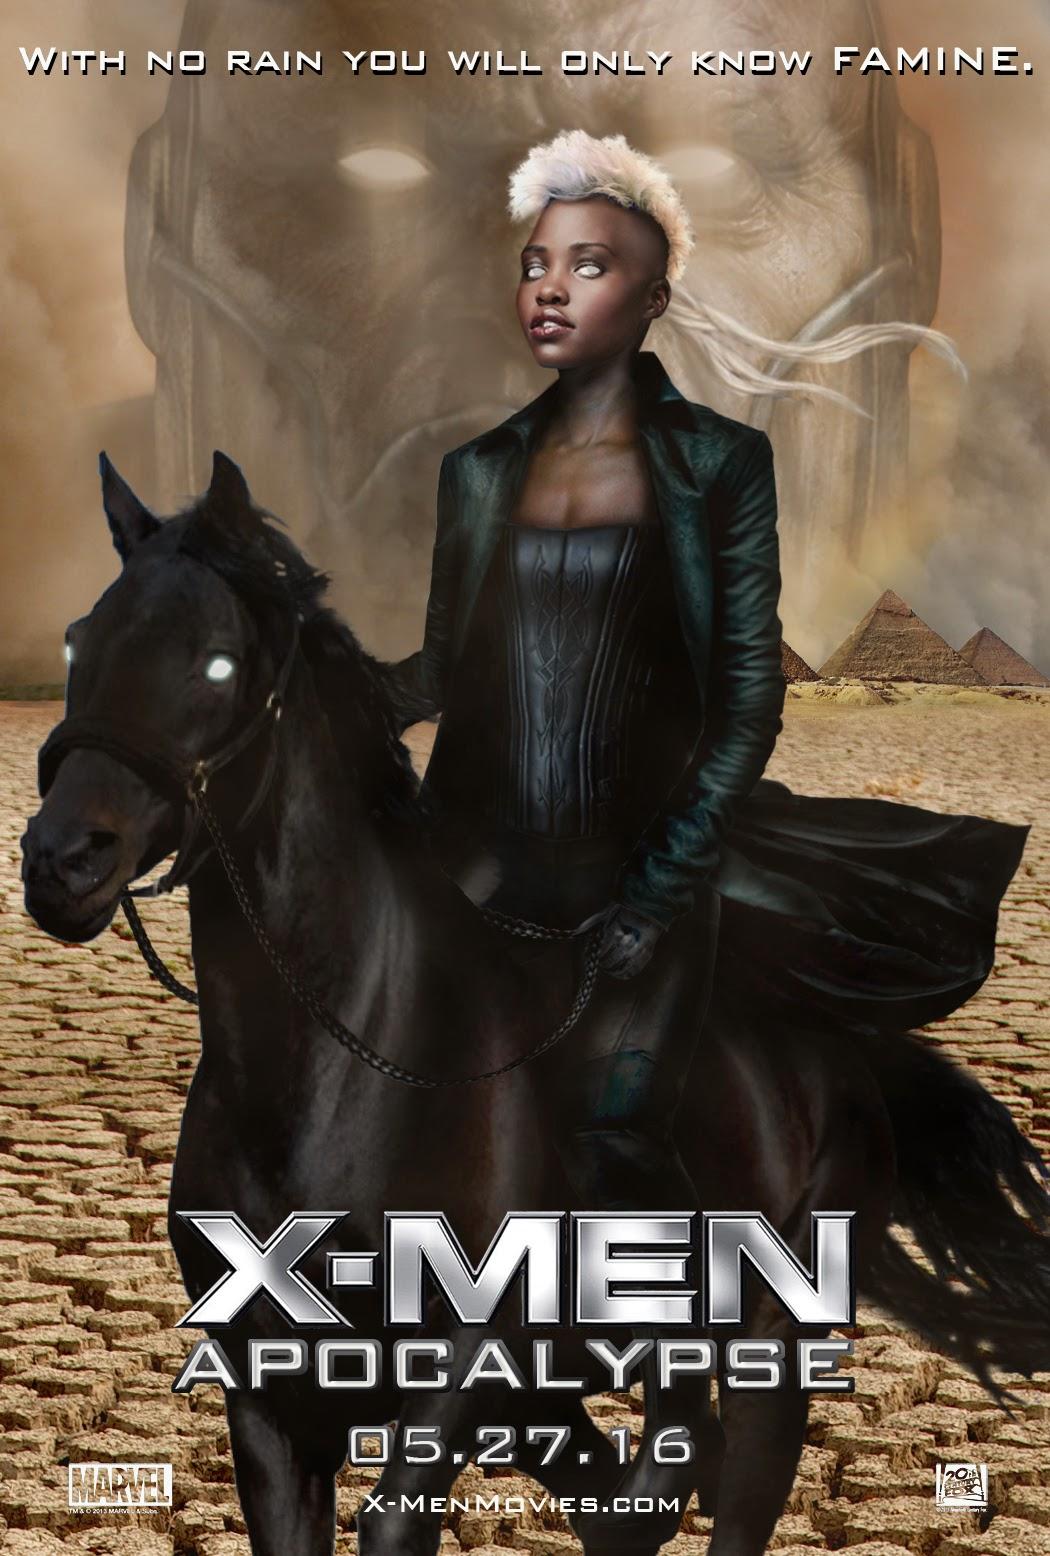 X-Men Apocalypse will be set X Men Apocalypse 2016 Poster